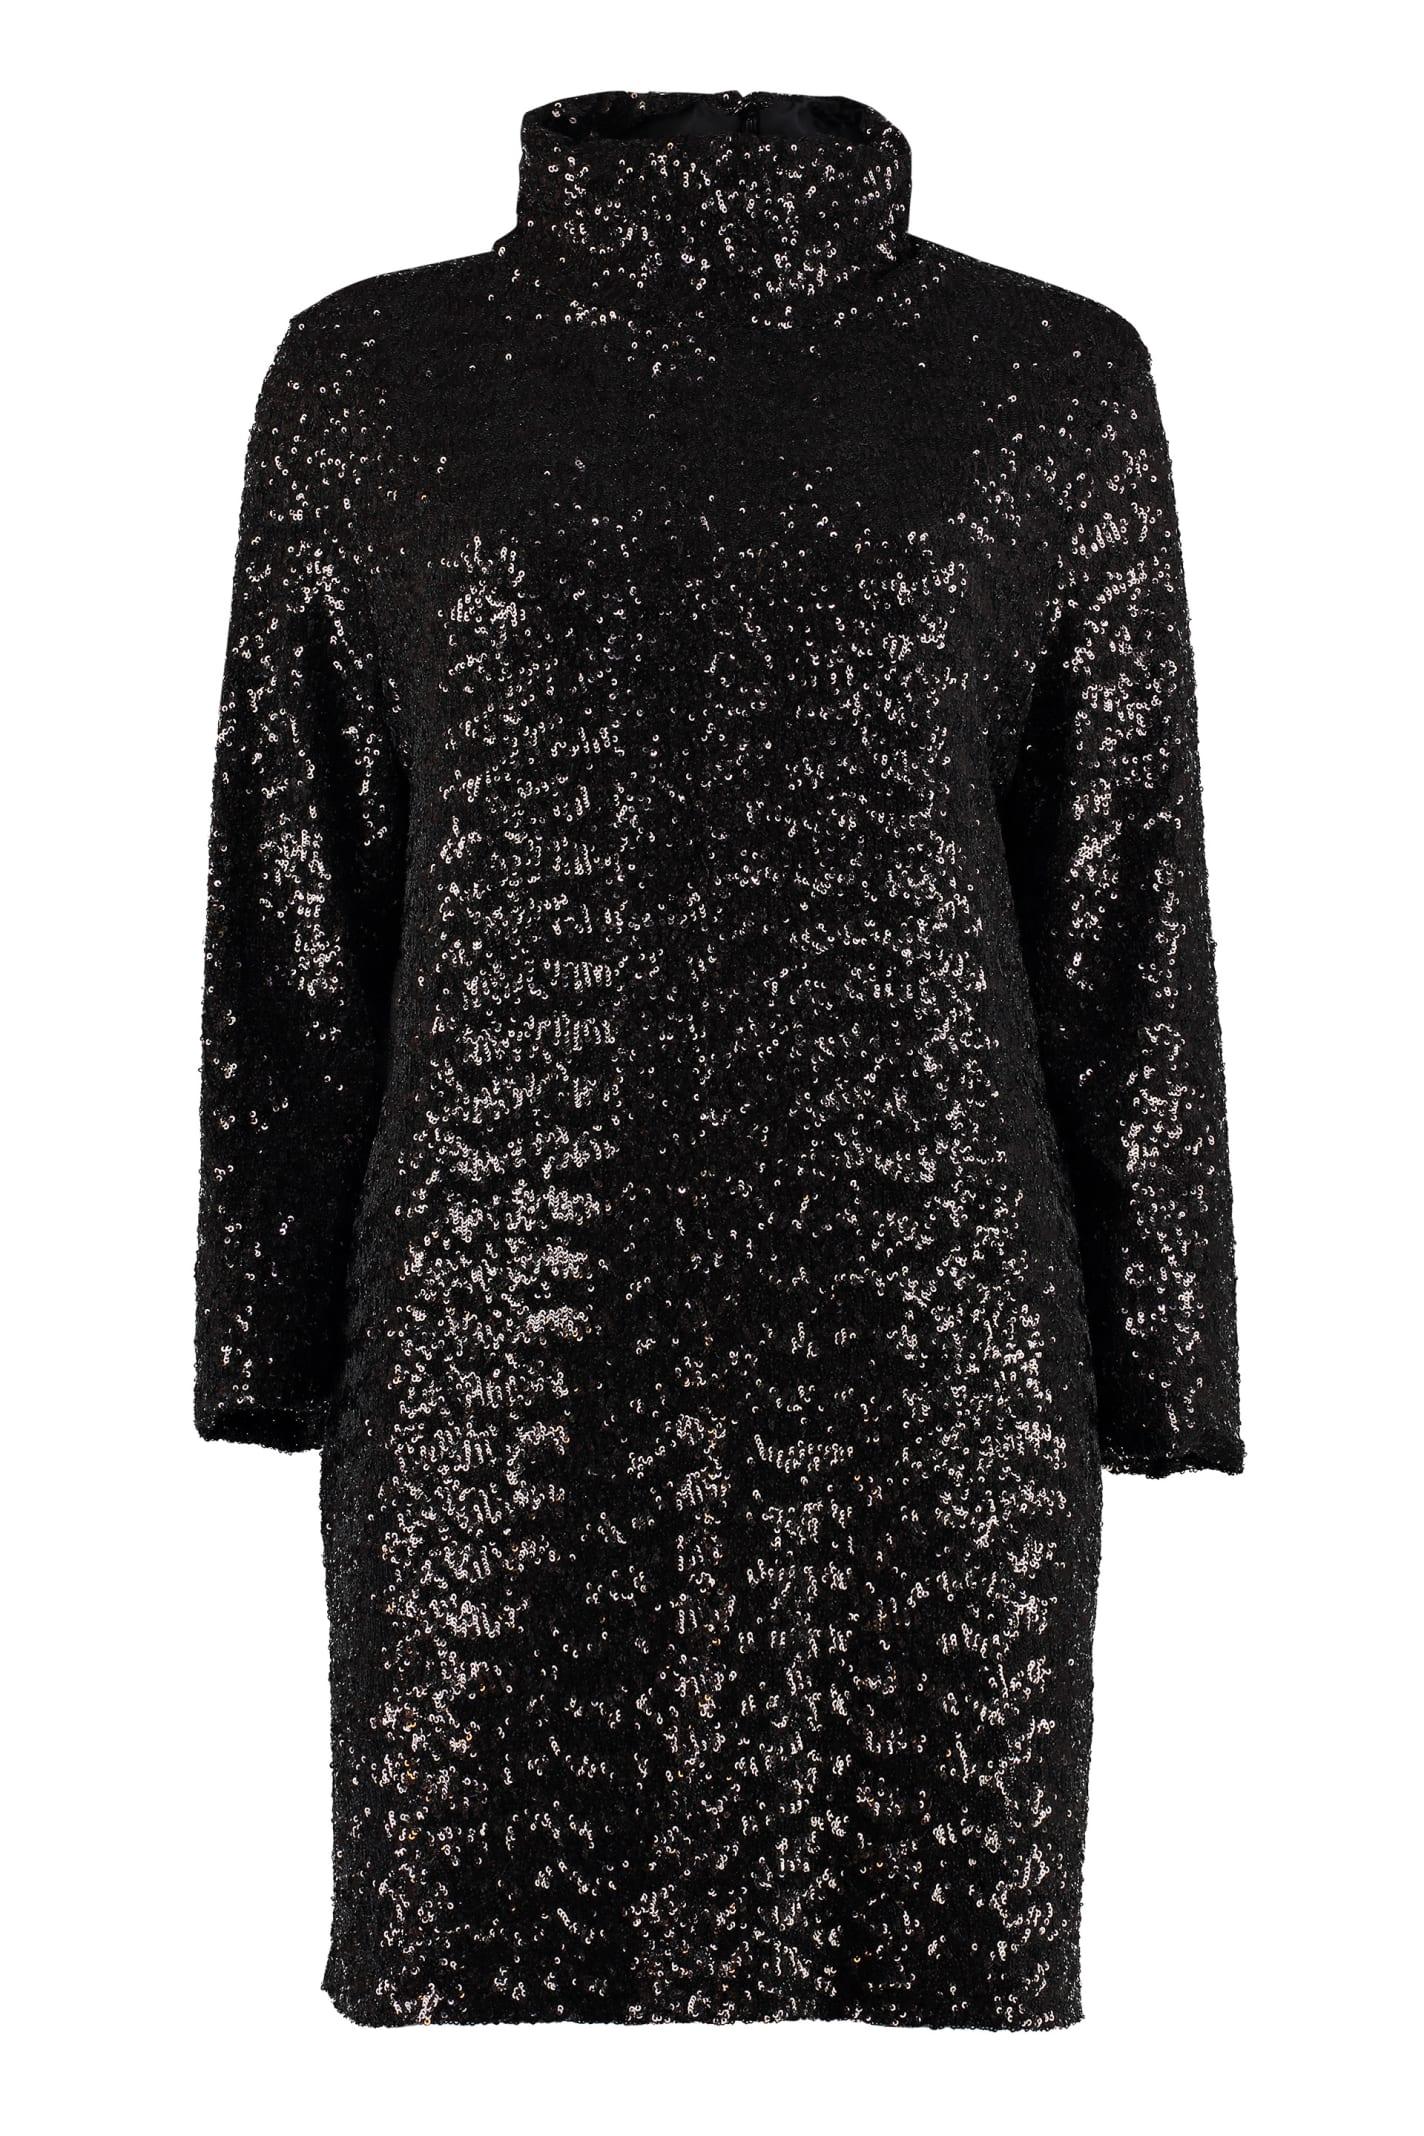 Buy Fabiana Filippi Sequin Mini-dress online, shop Fabiana Filippi with free shipping